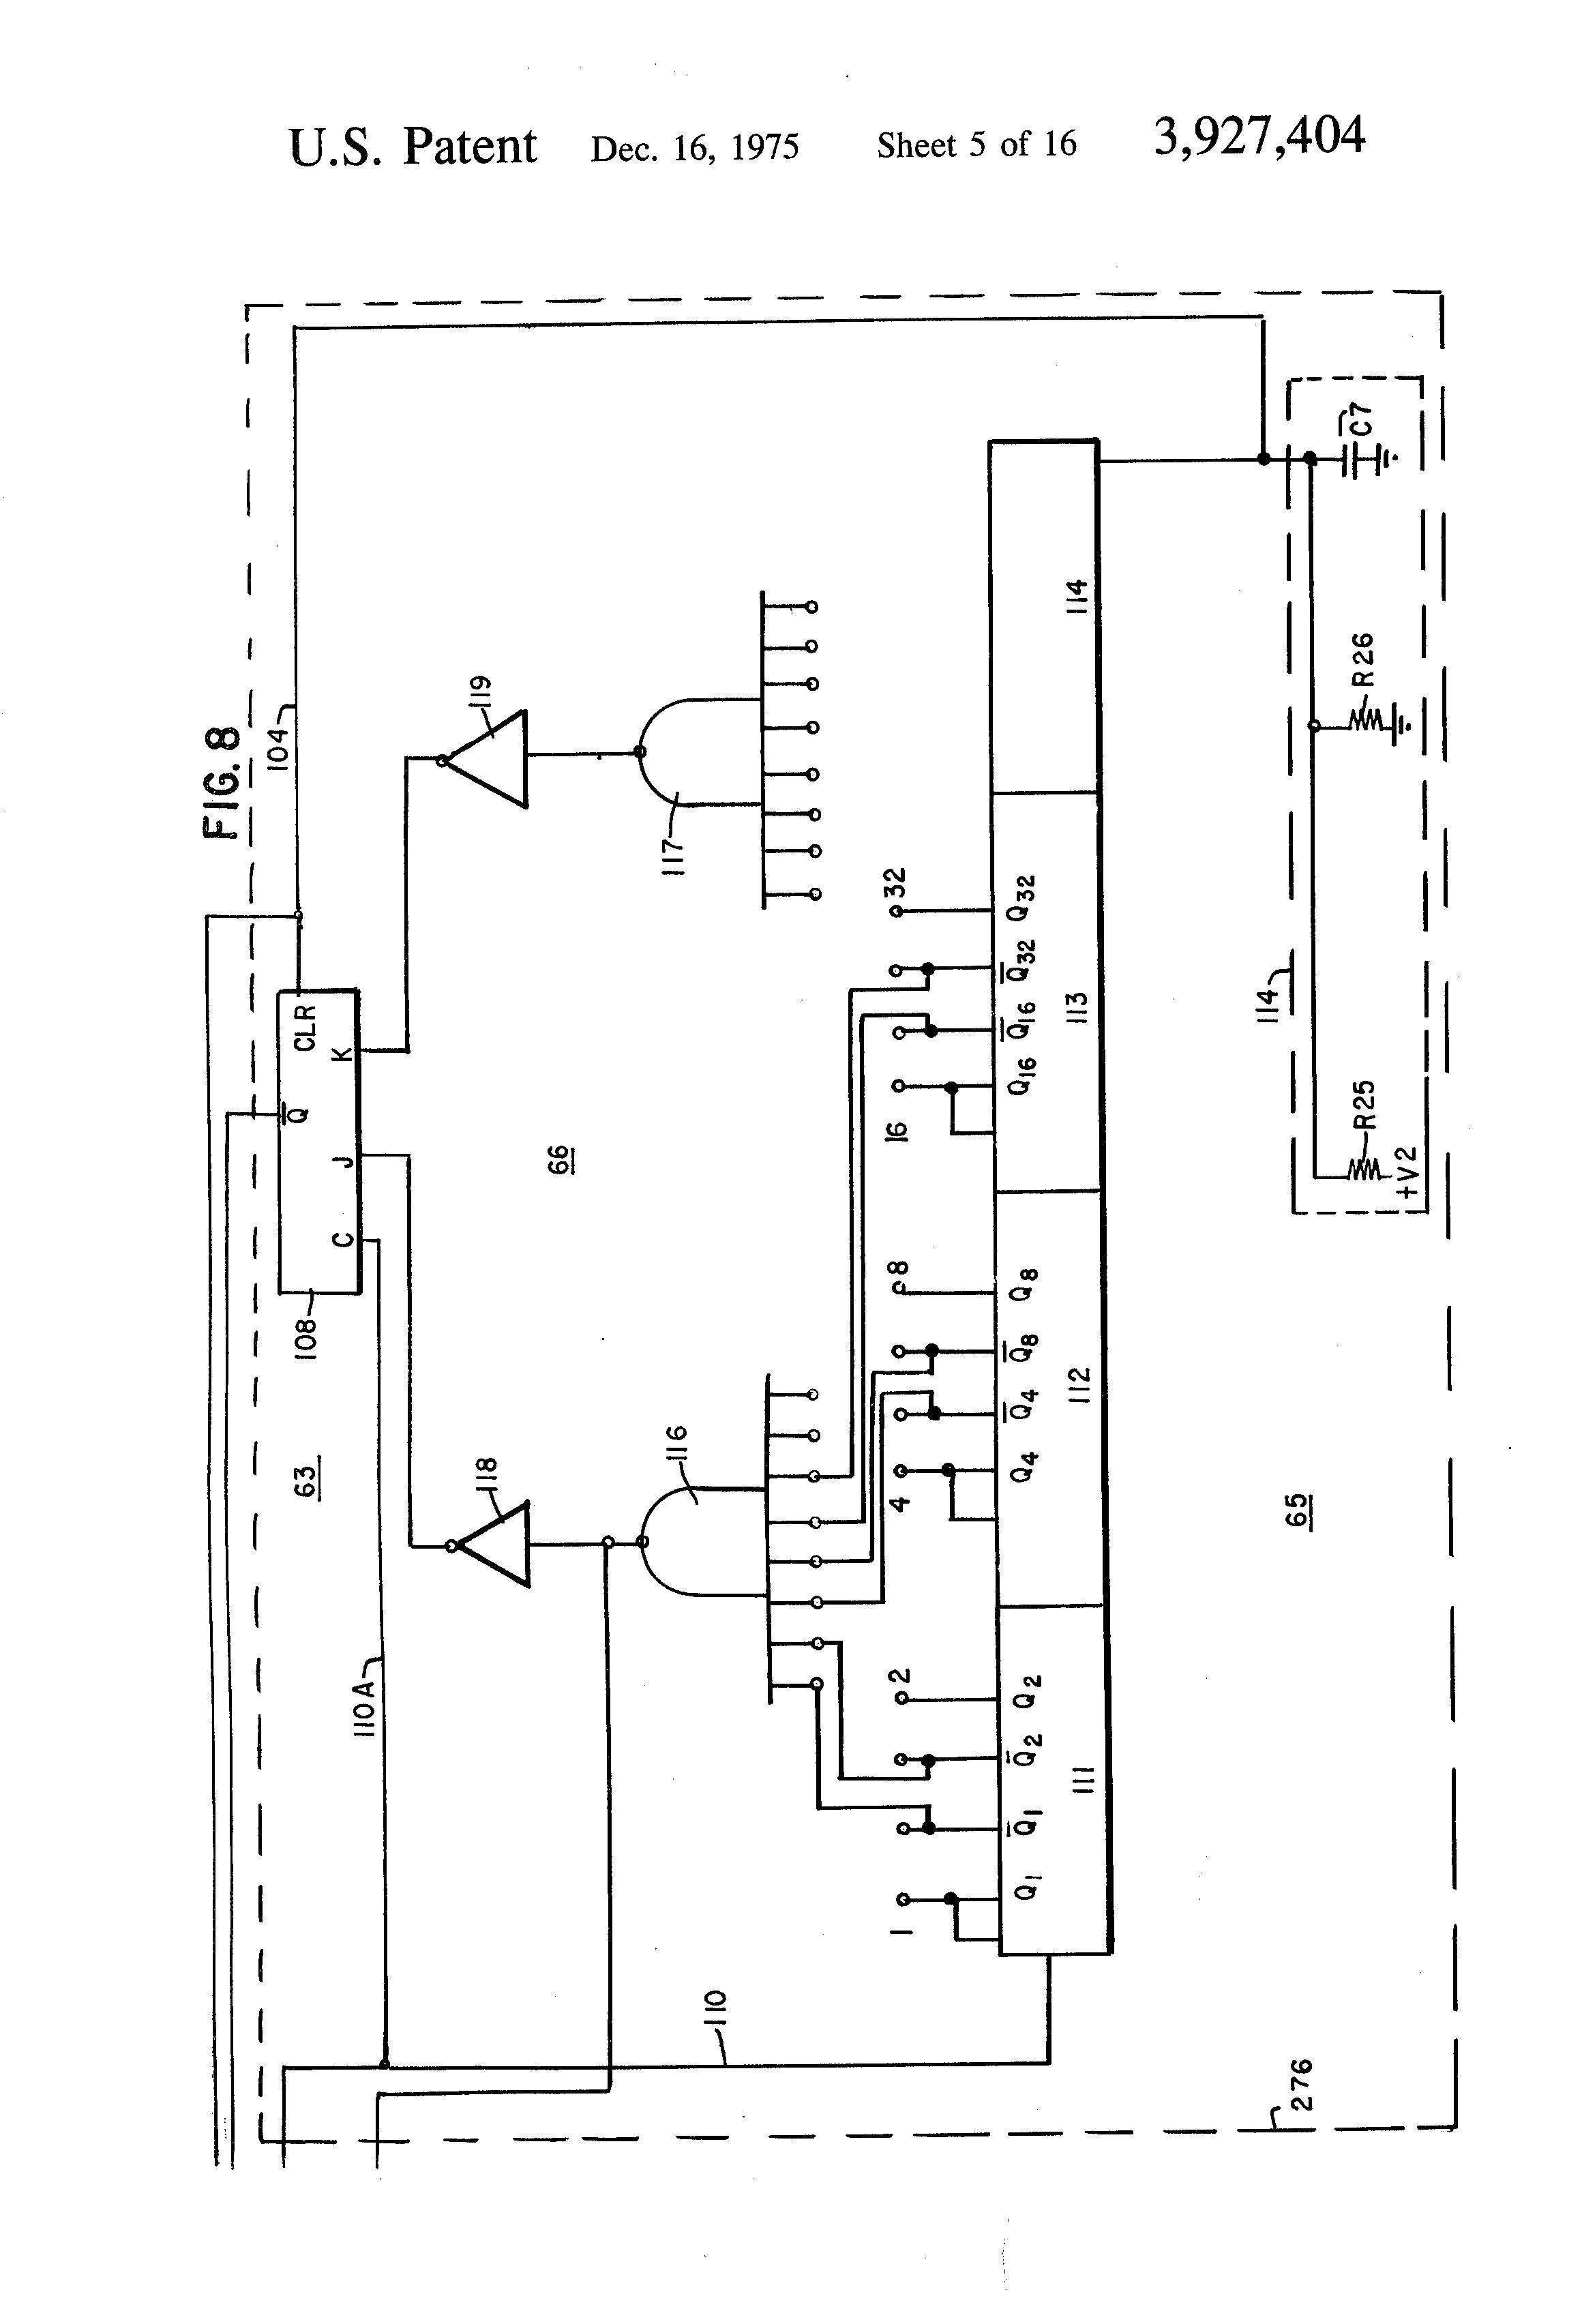 Gent S4 700 Wiring Diagram